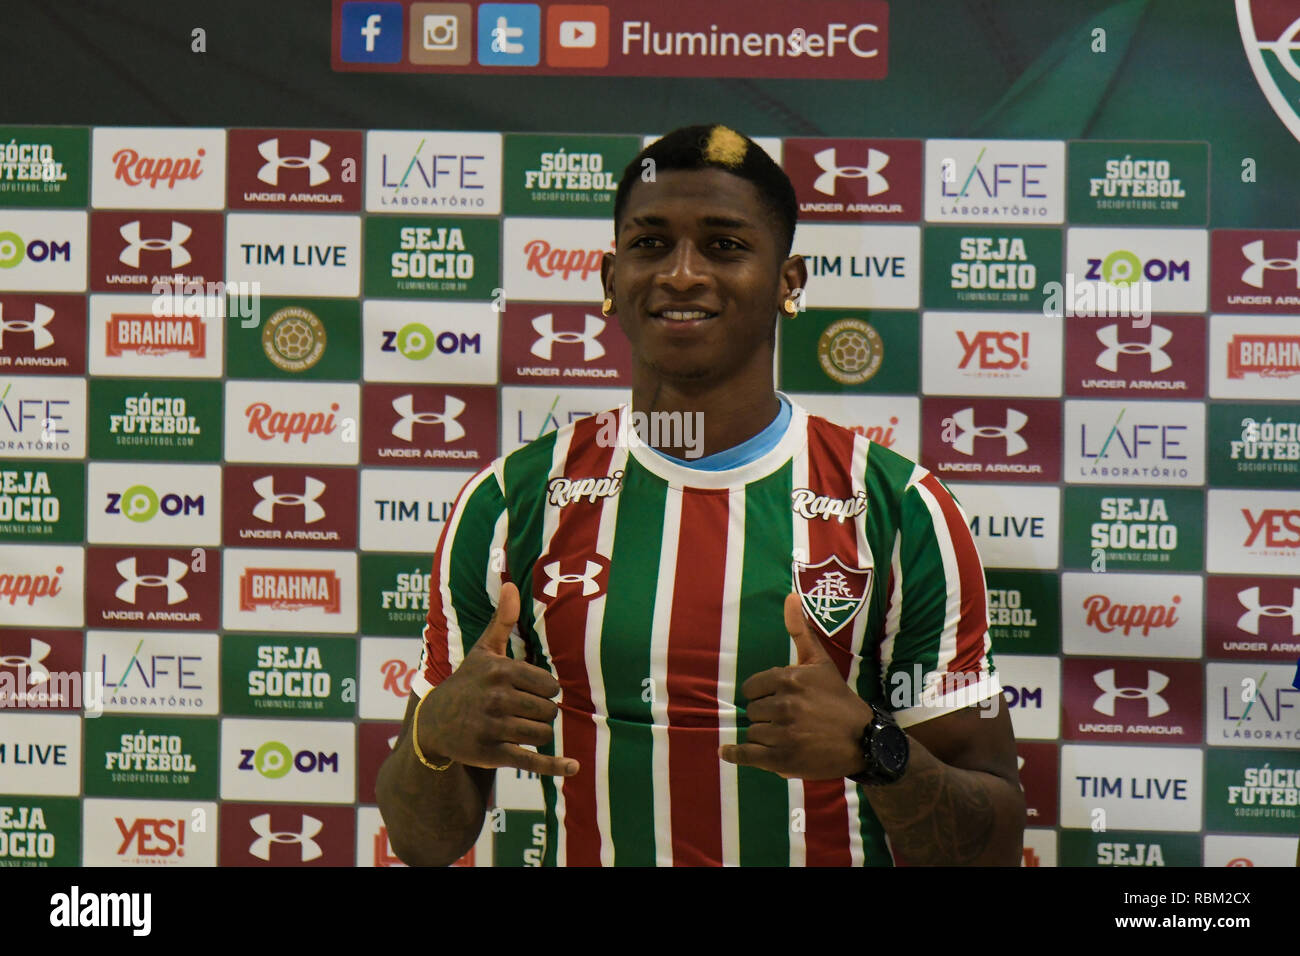 ... in Fluminense - Yony Gonzalez player of Fluminense during his official  presentation in a collective in the CT of Fluminense Photo  Thiago Ribeiro    AGIF 5f5671da6172c